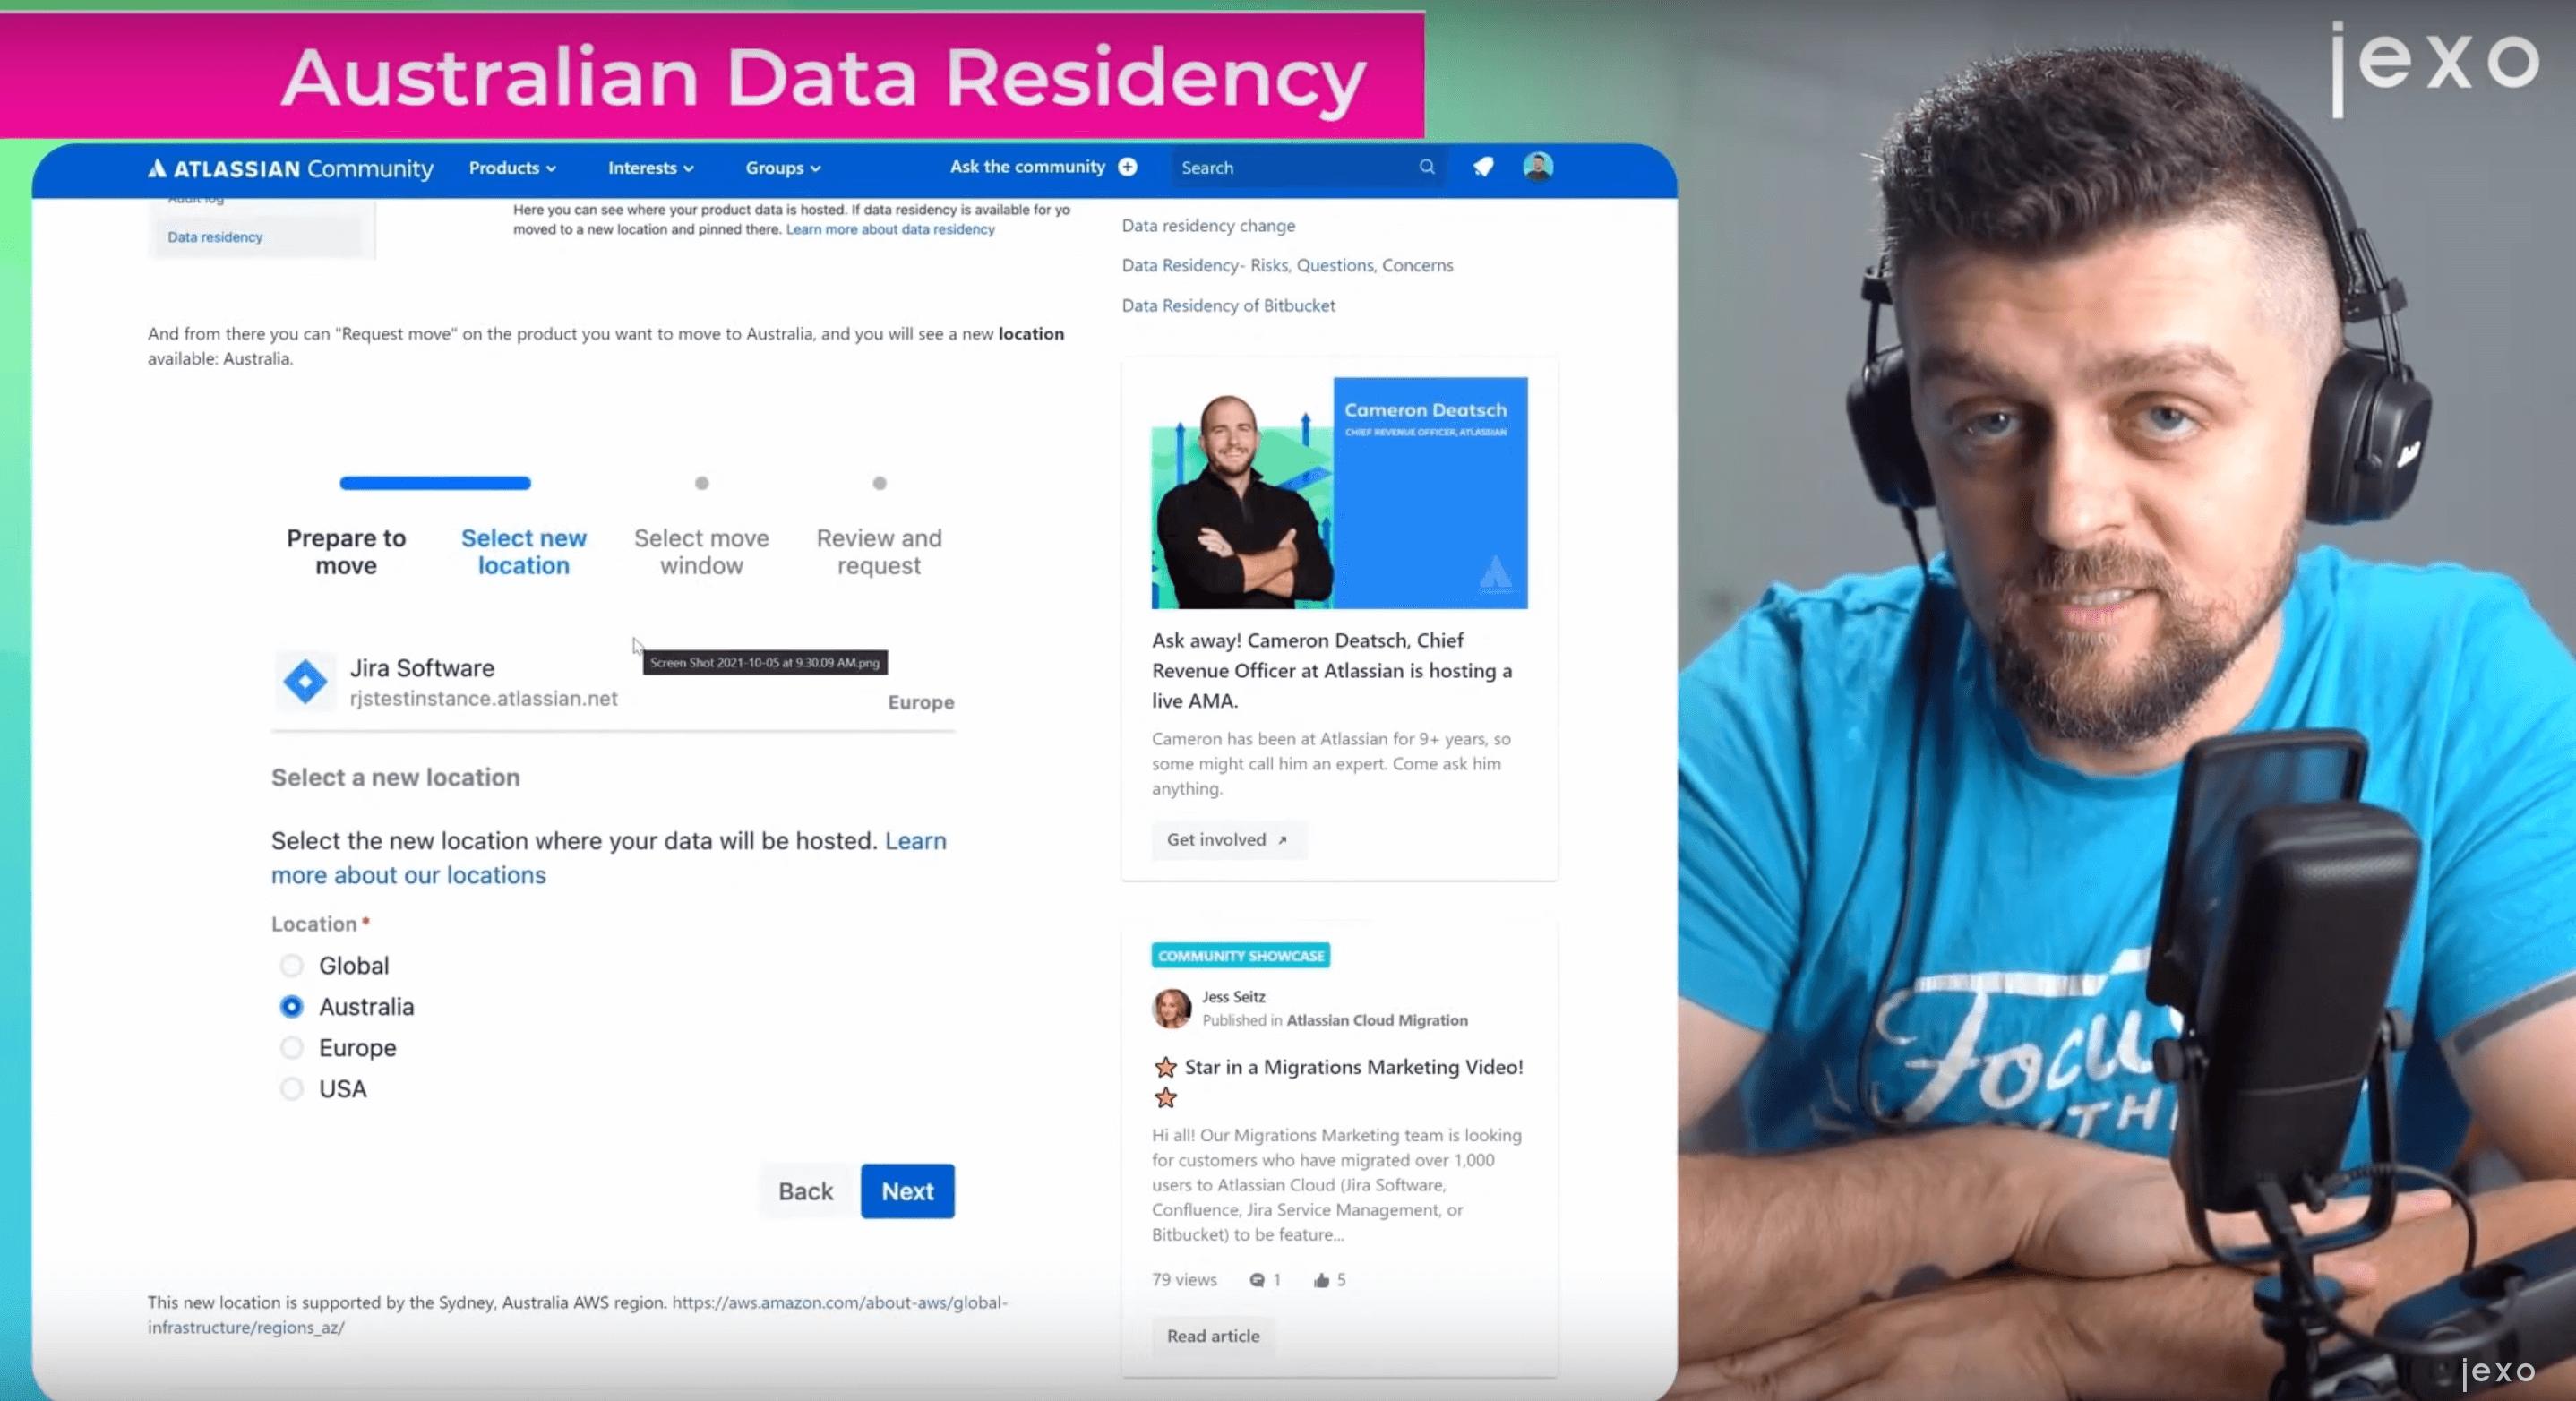 Atlassian news: Australian Data Residency for Jira and Confluence Cloud